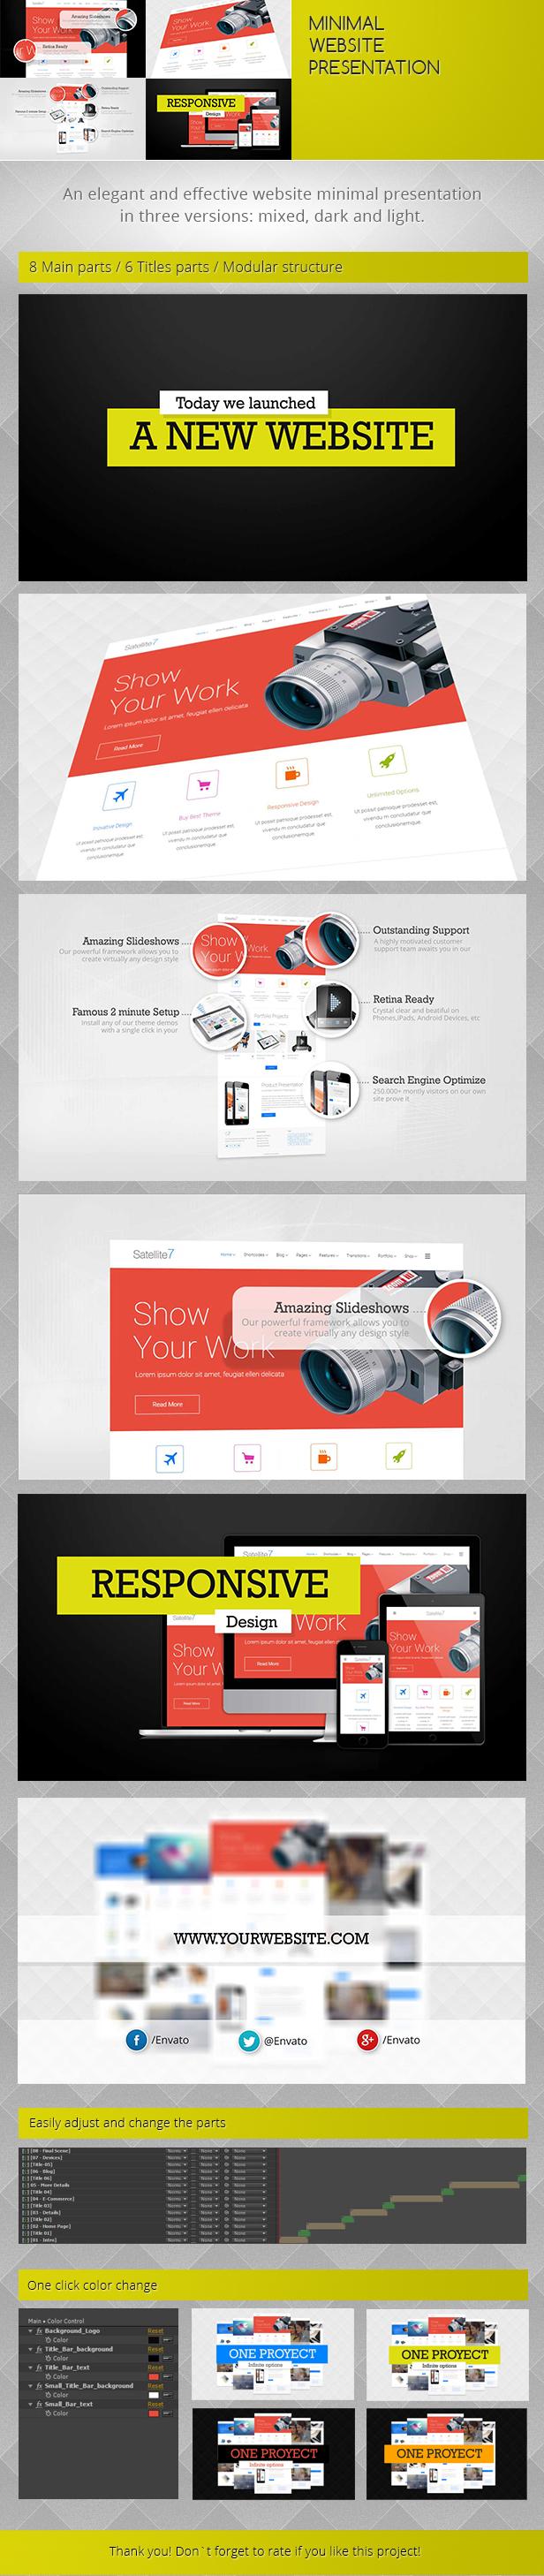 minimal-website-presentation-temaplate-wordpress-frames